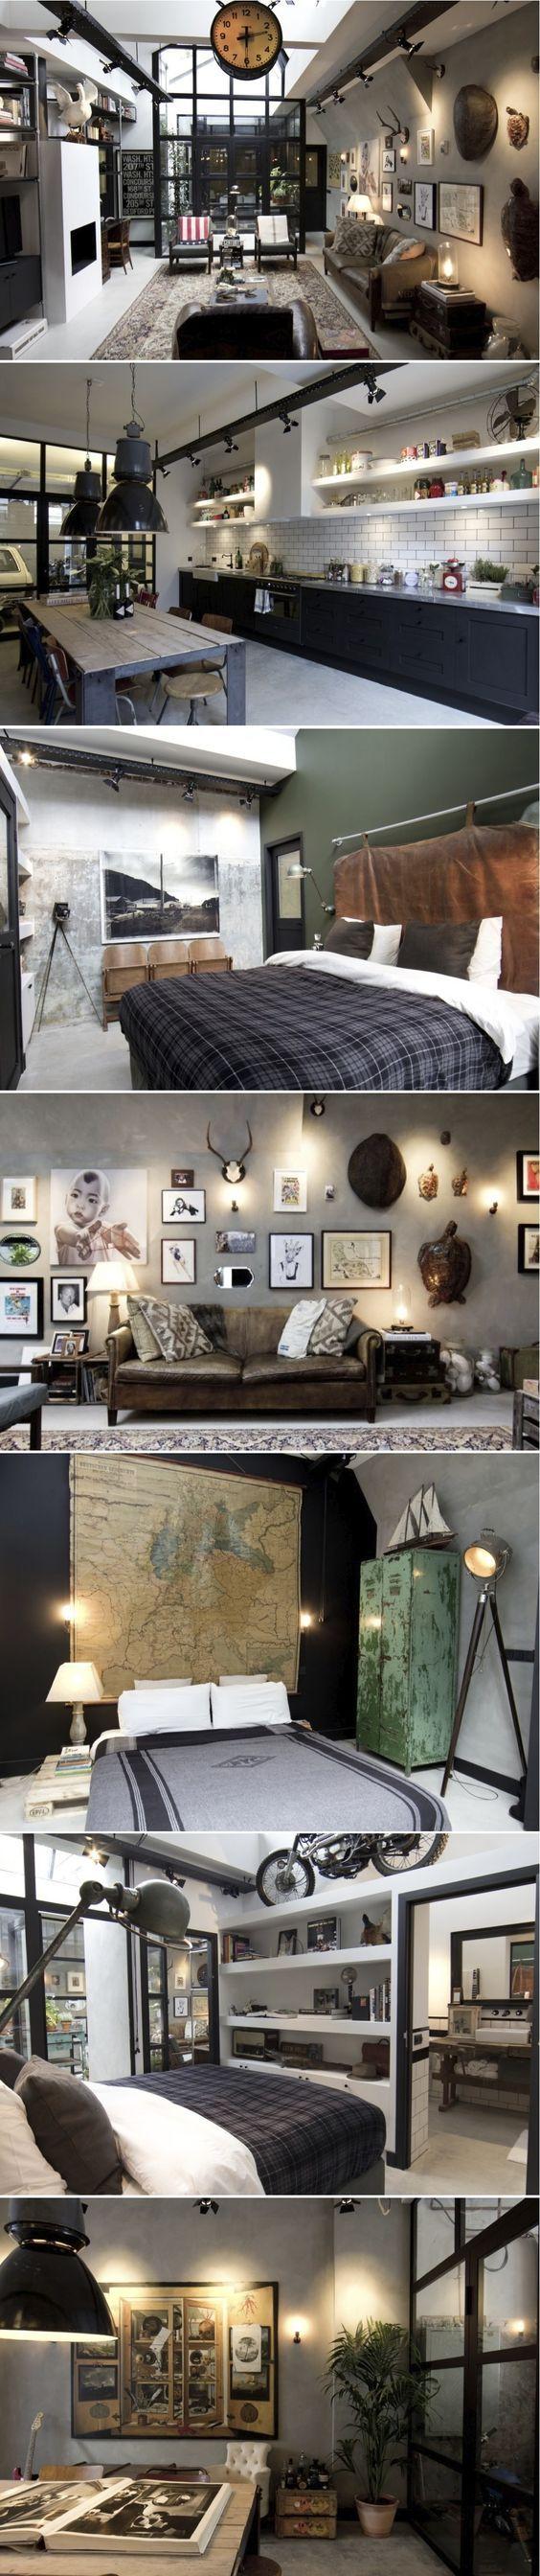 top 25 best garage loft ideas on pinterest garage loft. Black Bedroom Furniture Sets. Home Design Ideas